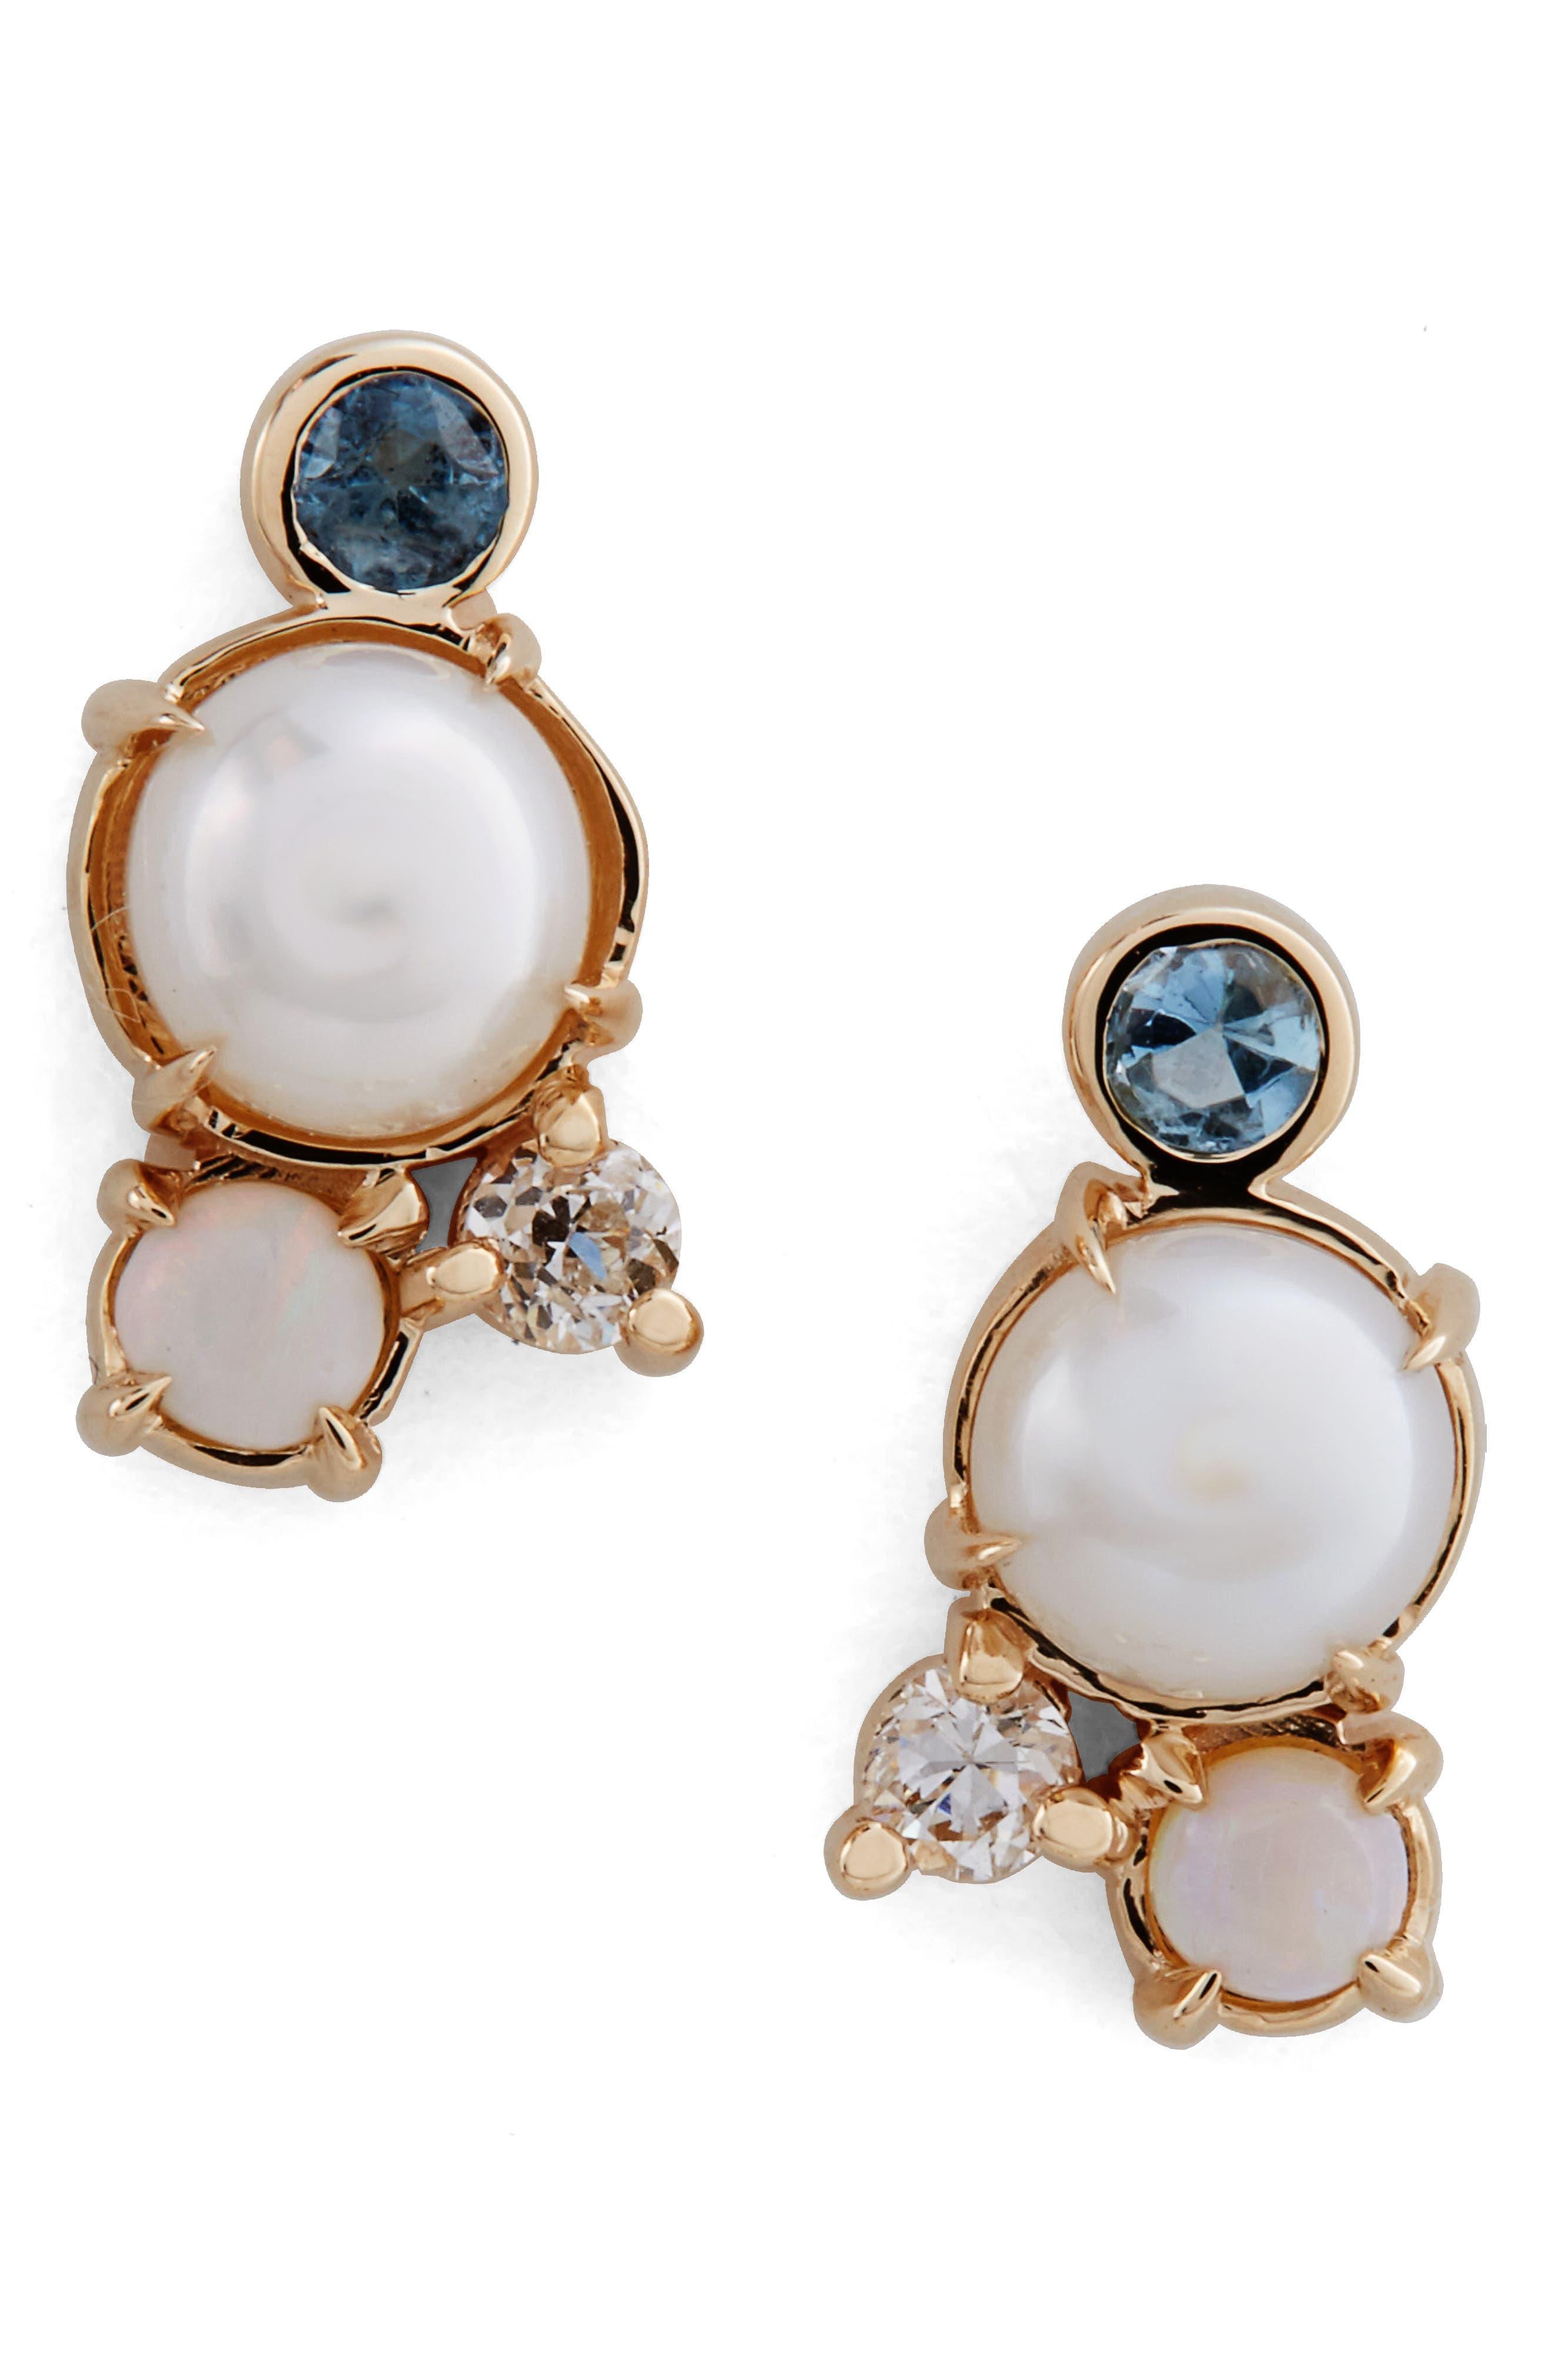 MOCIUN Pearl, Aquamarine, Opal & Diamond Earrings (Nordstrom Exclusive)